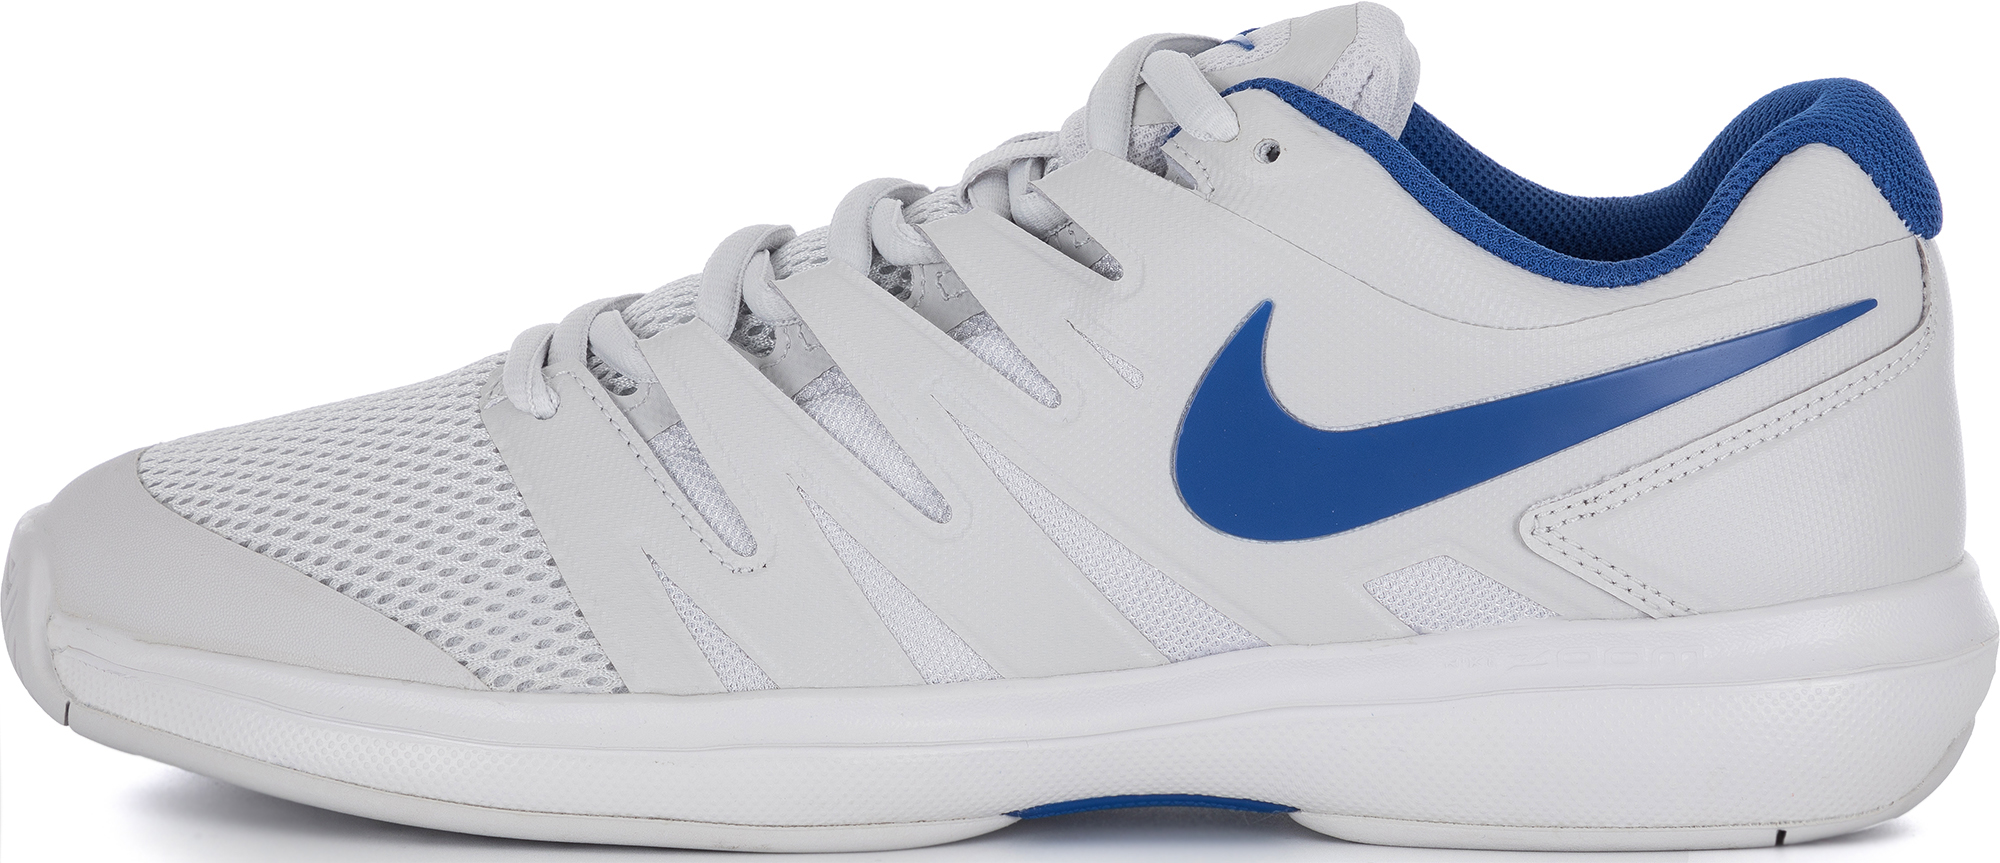 Nike Кроссовки мужские Nike Air Zoom Prestige Hc, размер 46,5